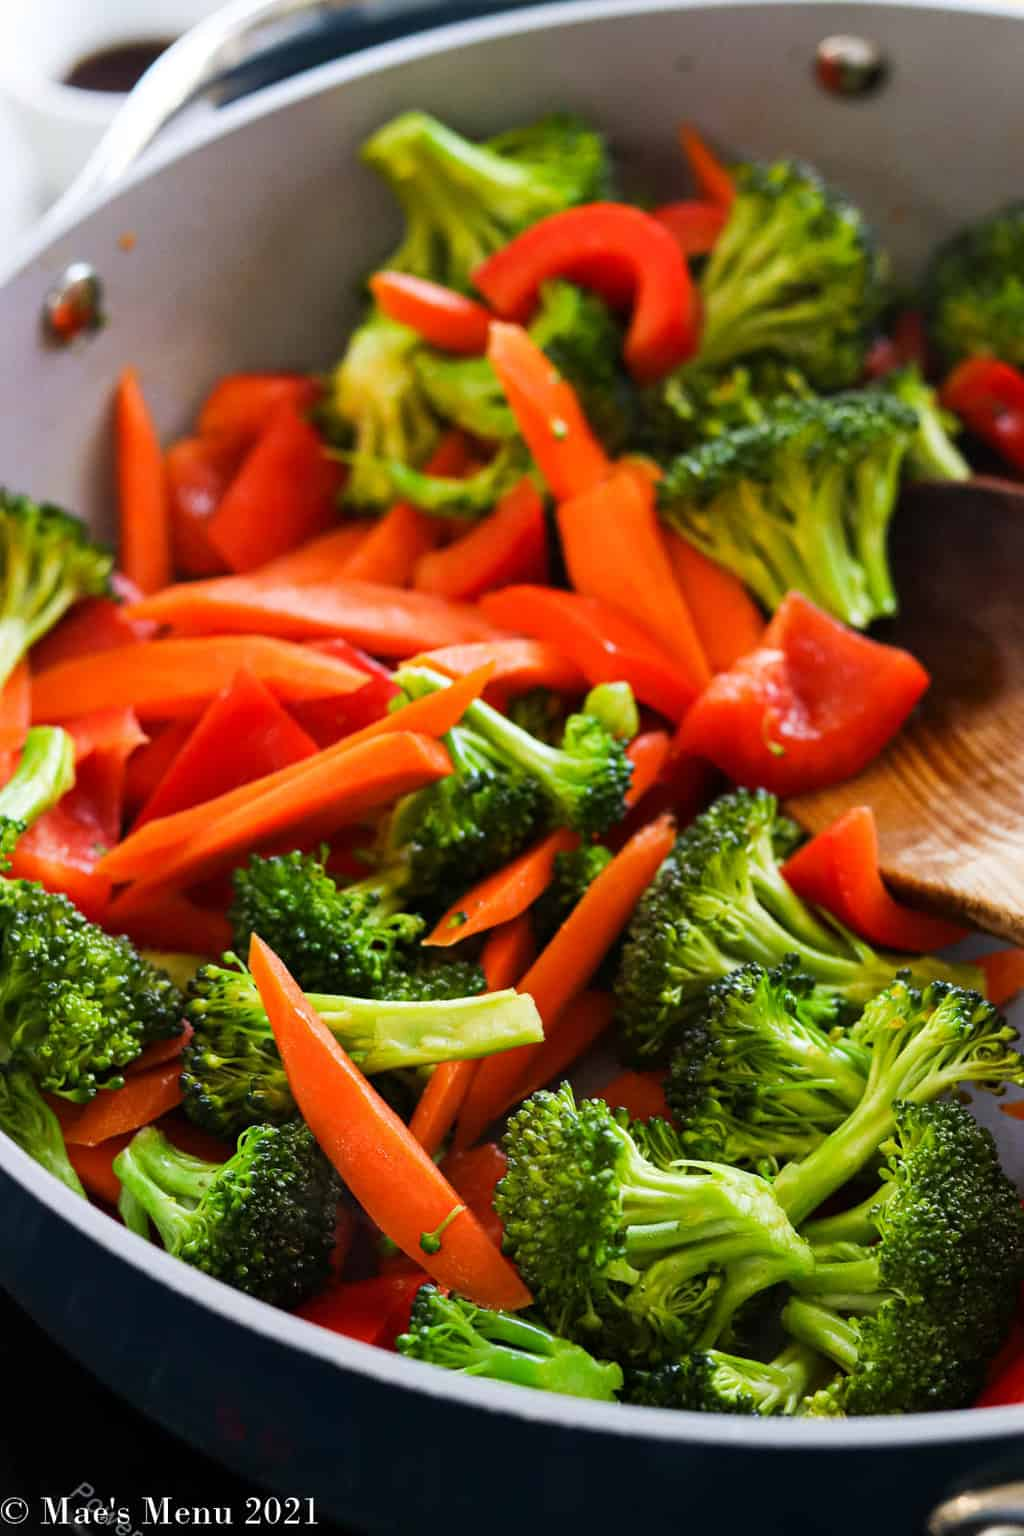 sauteing veggies in a pan